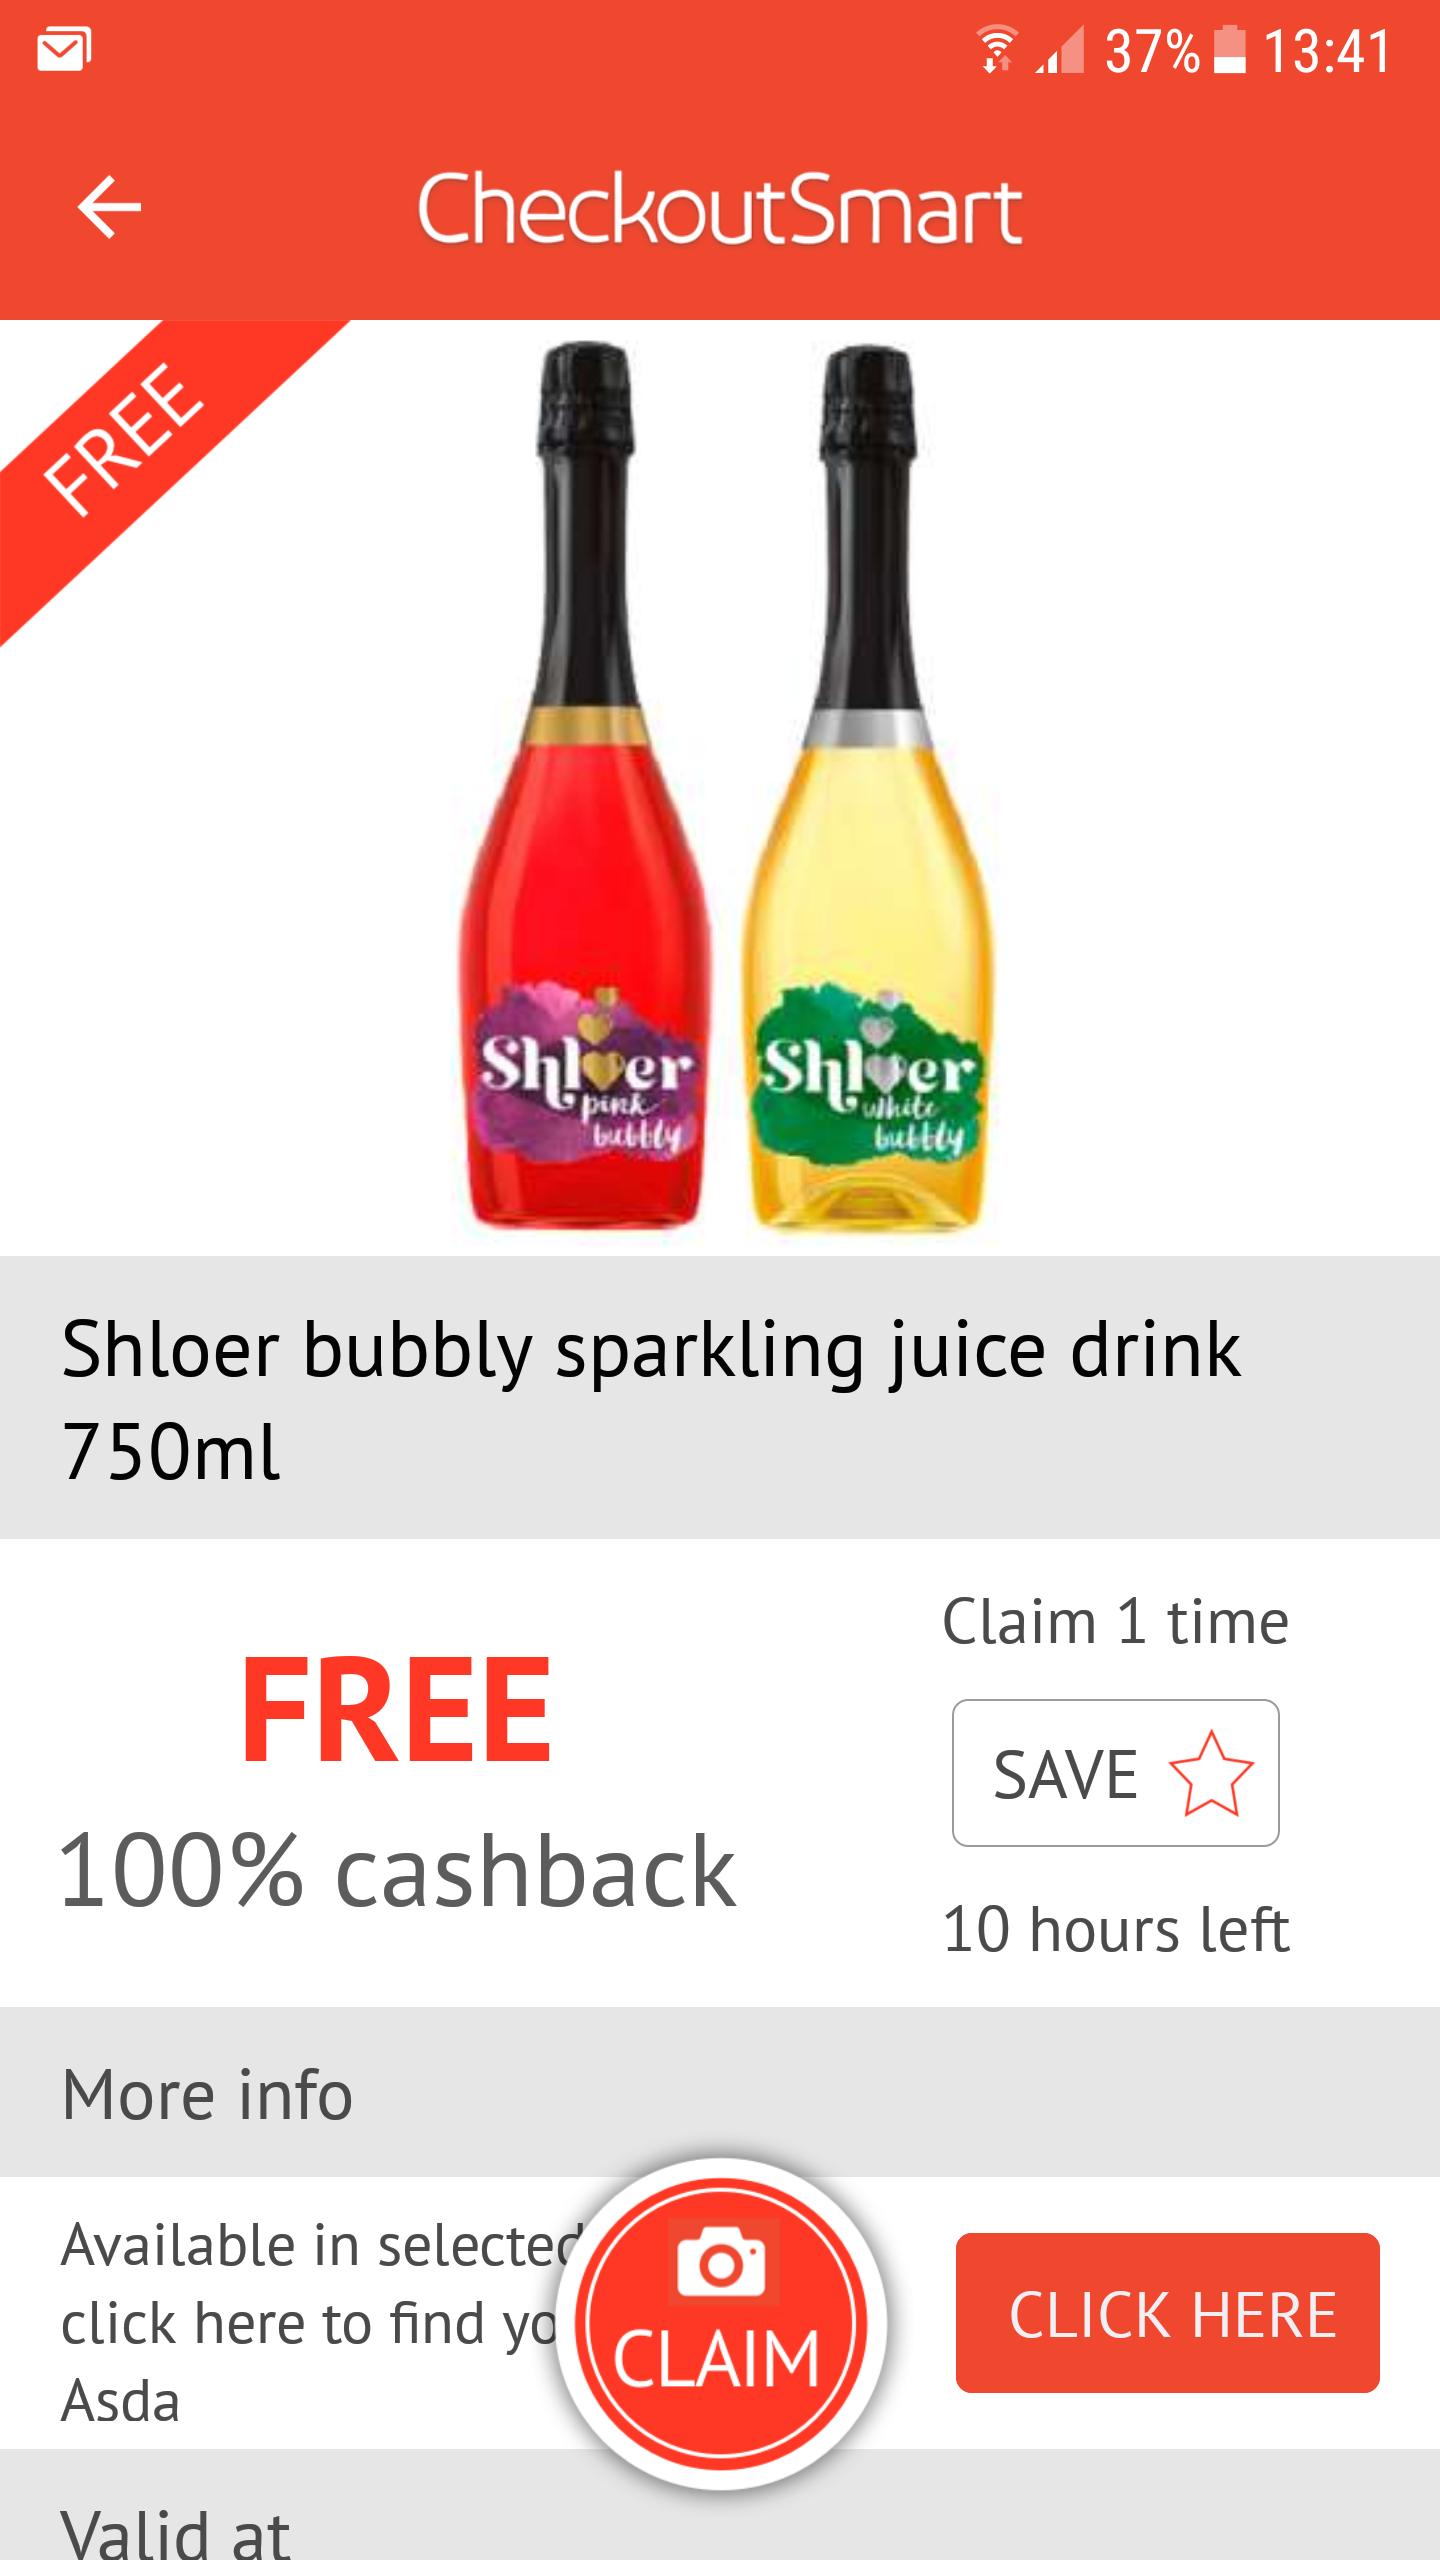 FREE Shloer Bubbly via Checkoutsmart (£2.99 @ Asda)